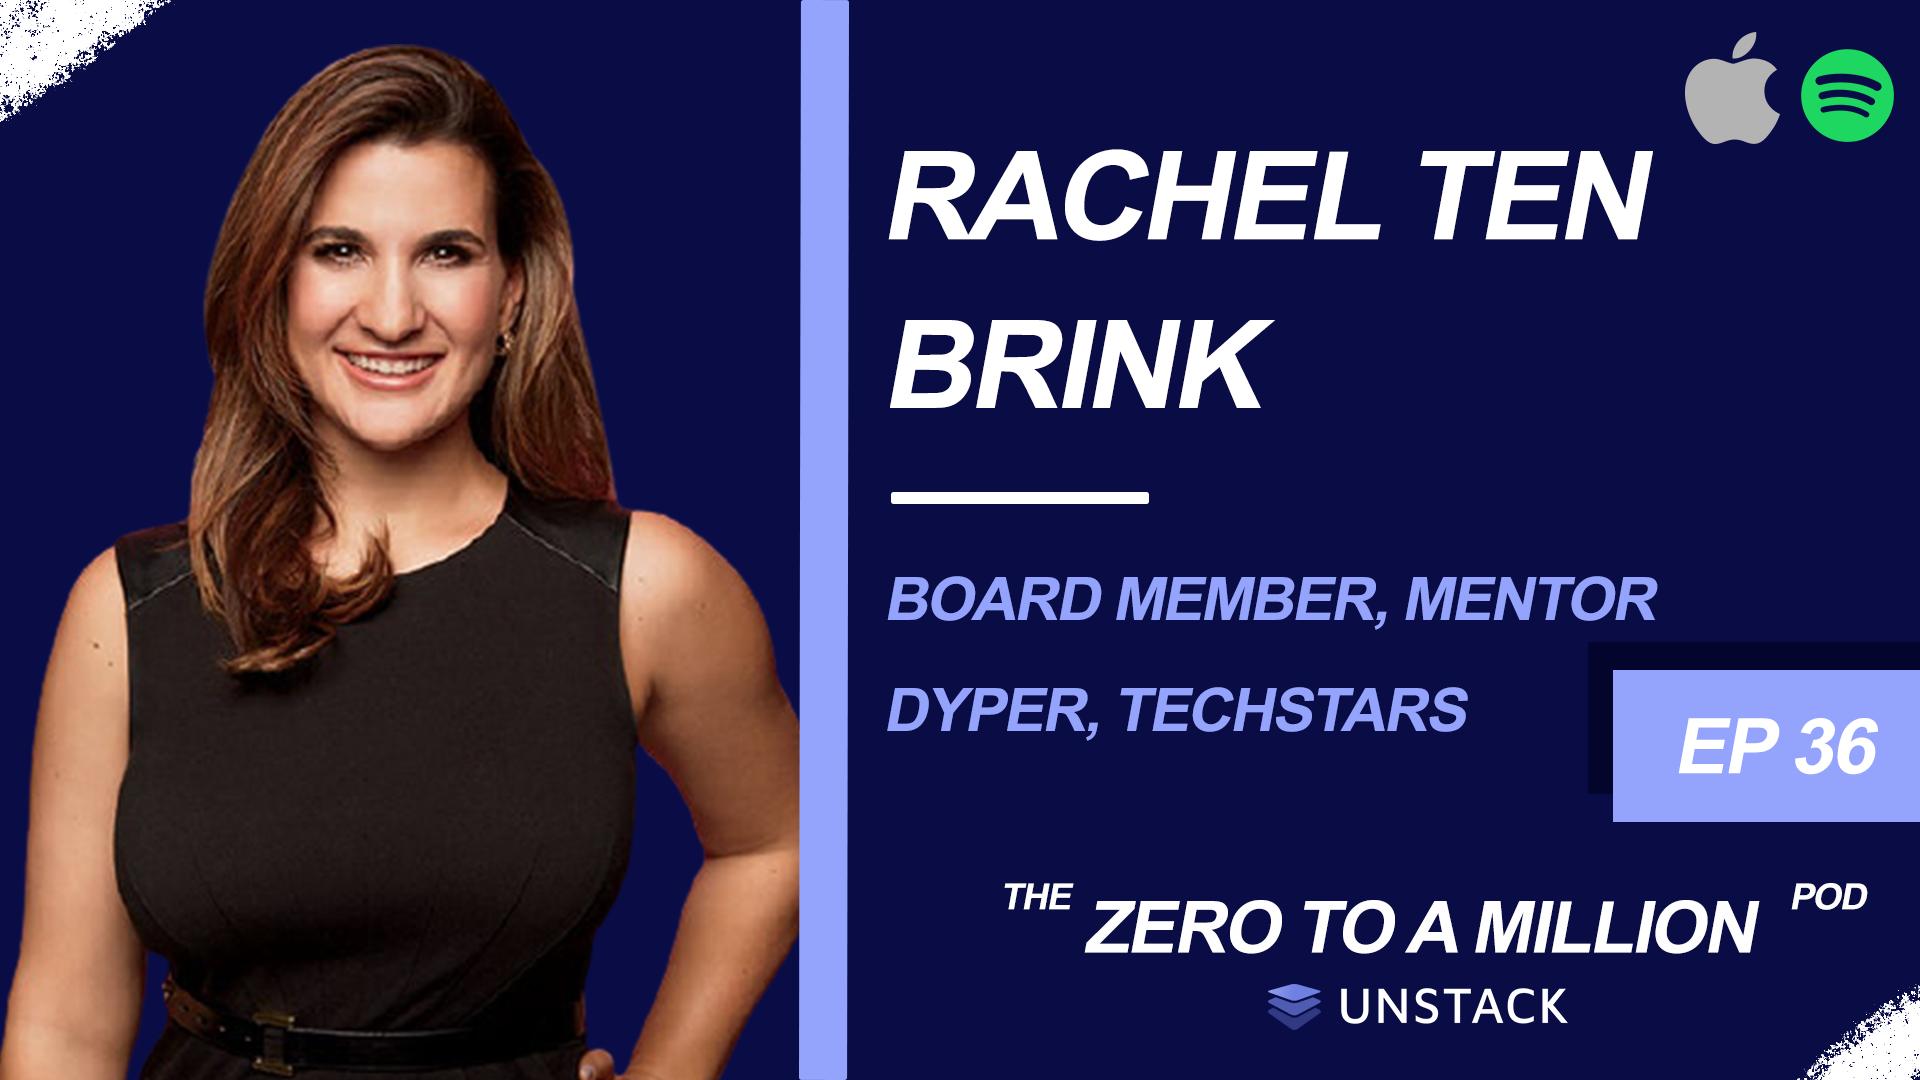 Zero to a Million, Episode 36: Rachel Ten Brink